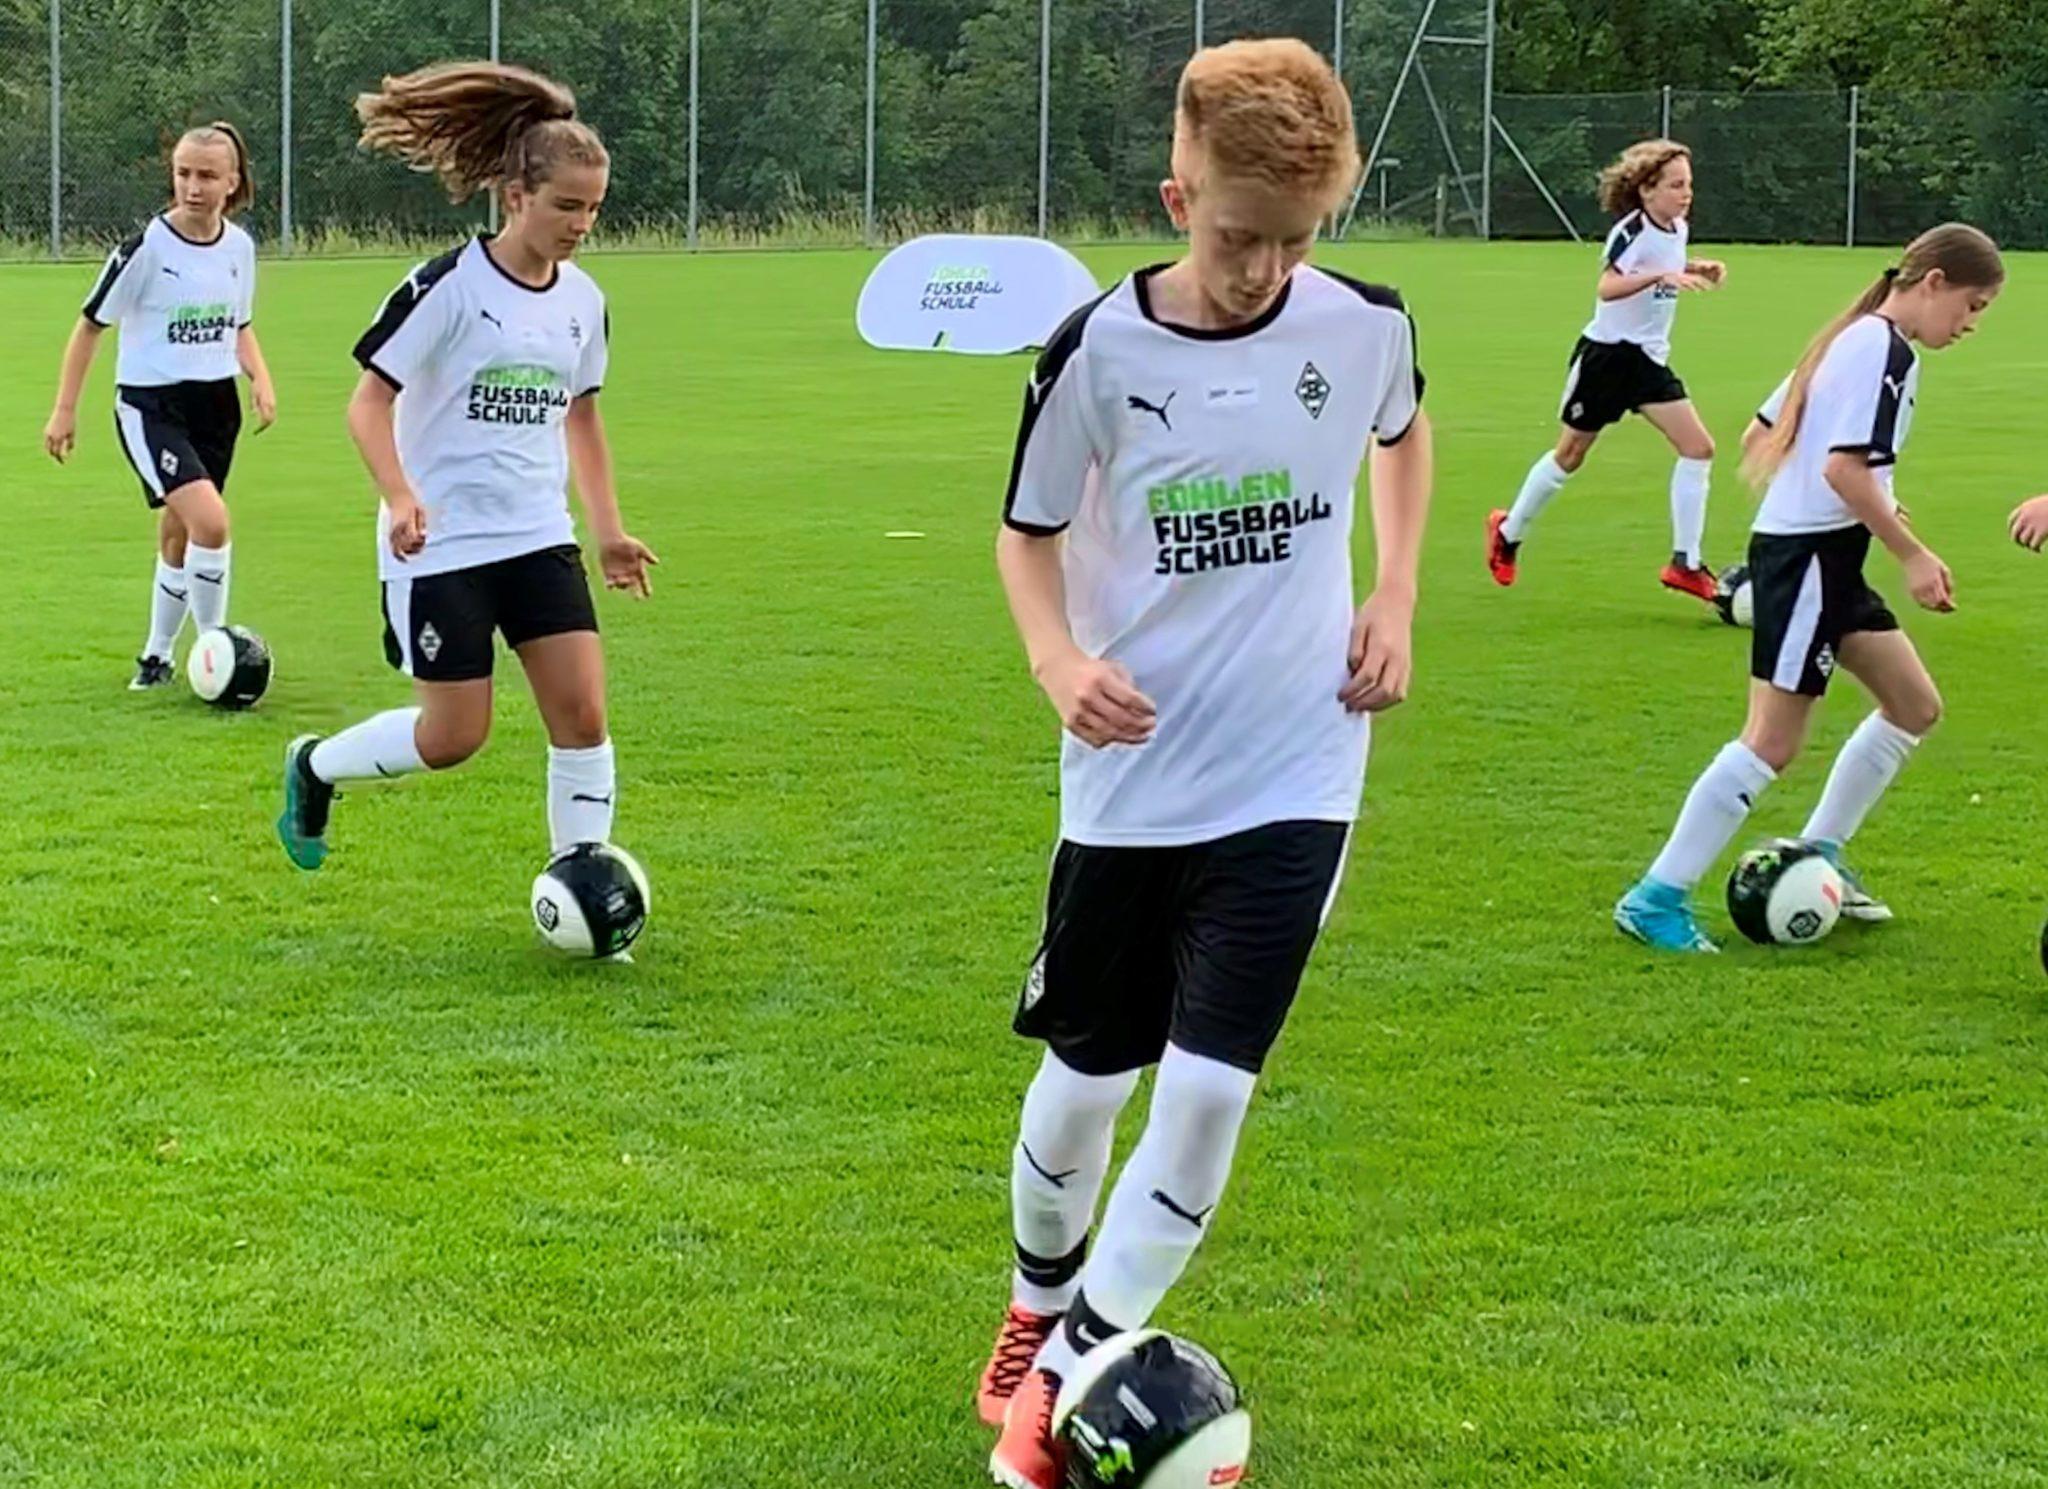 Borussia Mönchengladbach Fussballschule